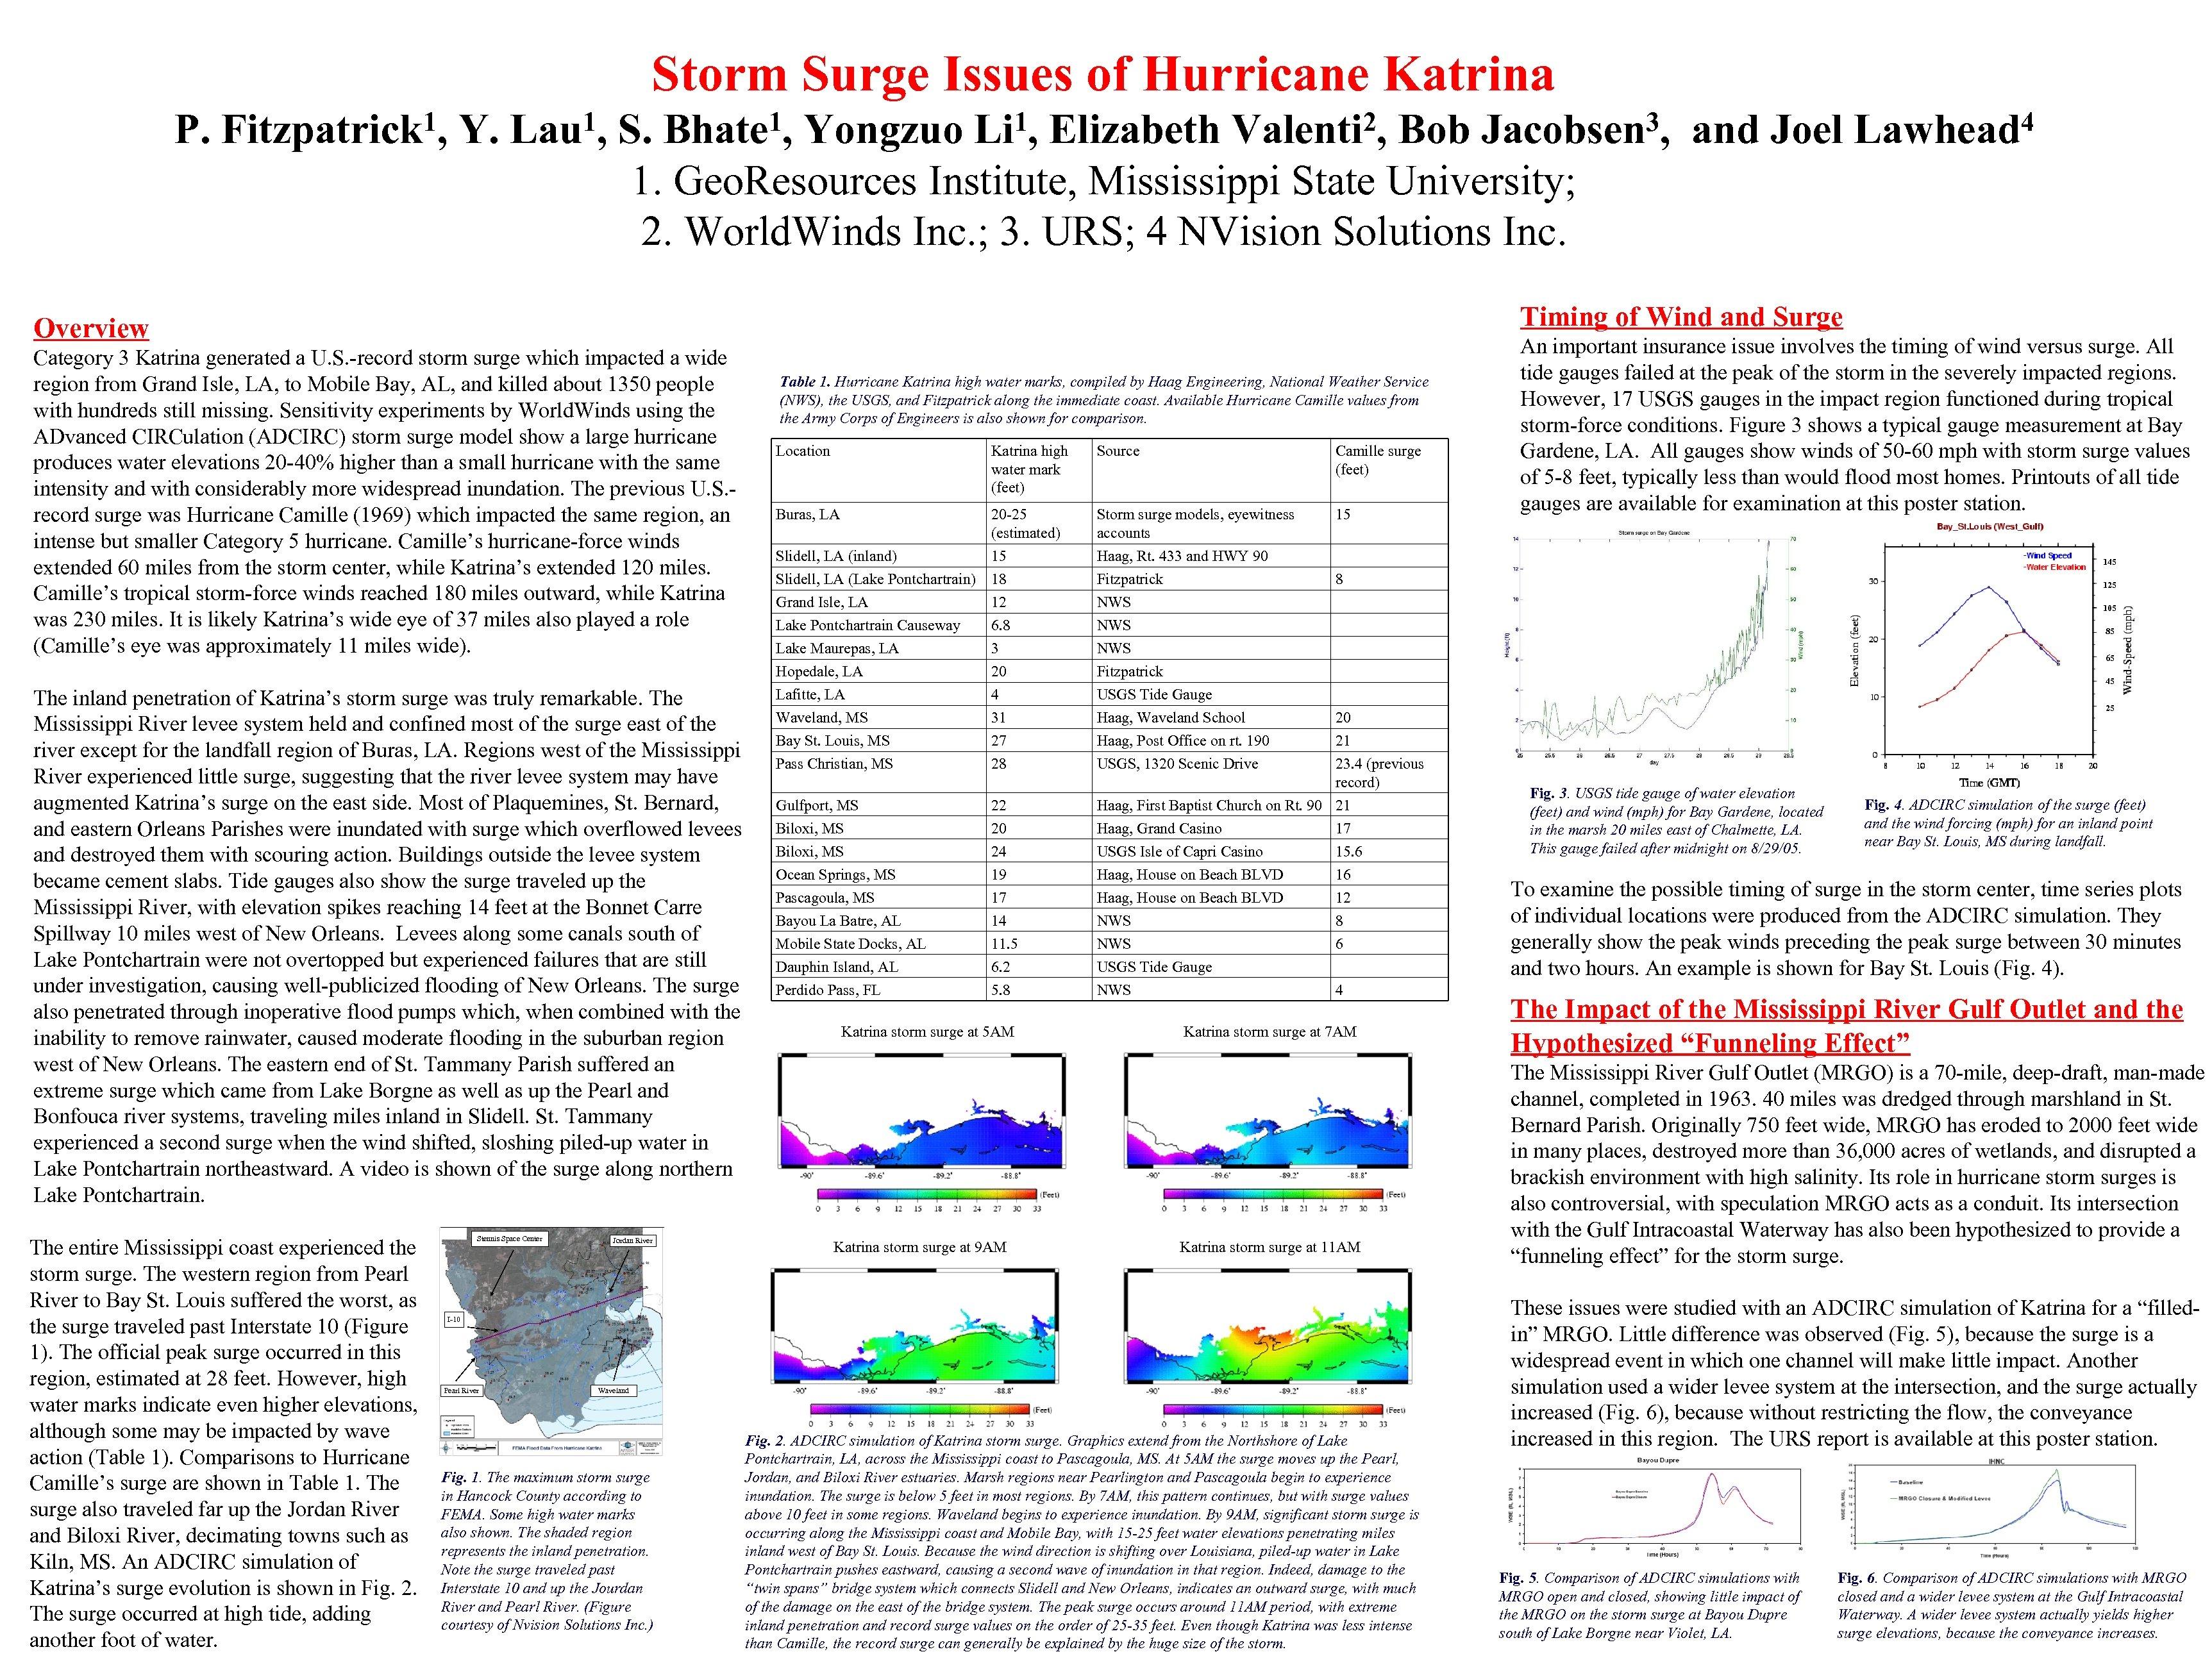 Storm Surge Issues of Hurricane Katrina P. 1, Fitzpatrick Y. 1, Lau 1, Bhate